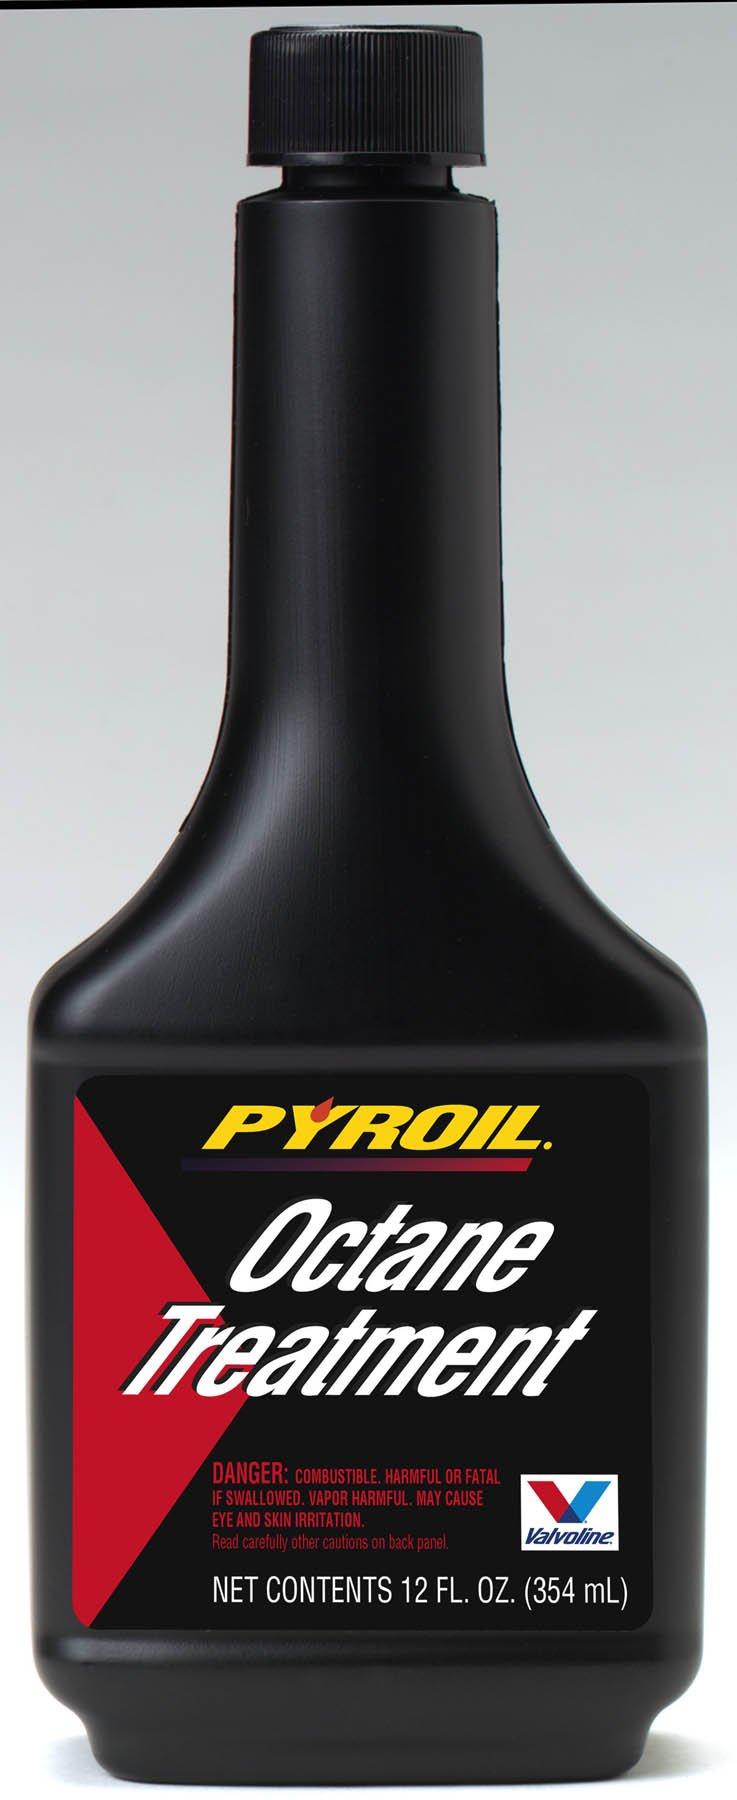 Valvoline 40463 Pyroil 12 oz Octane Treatment